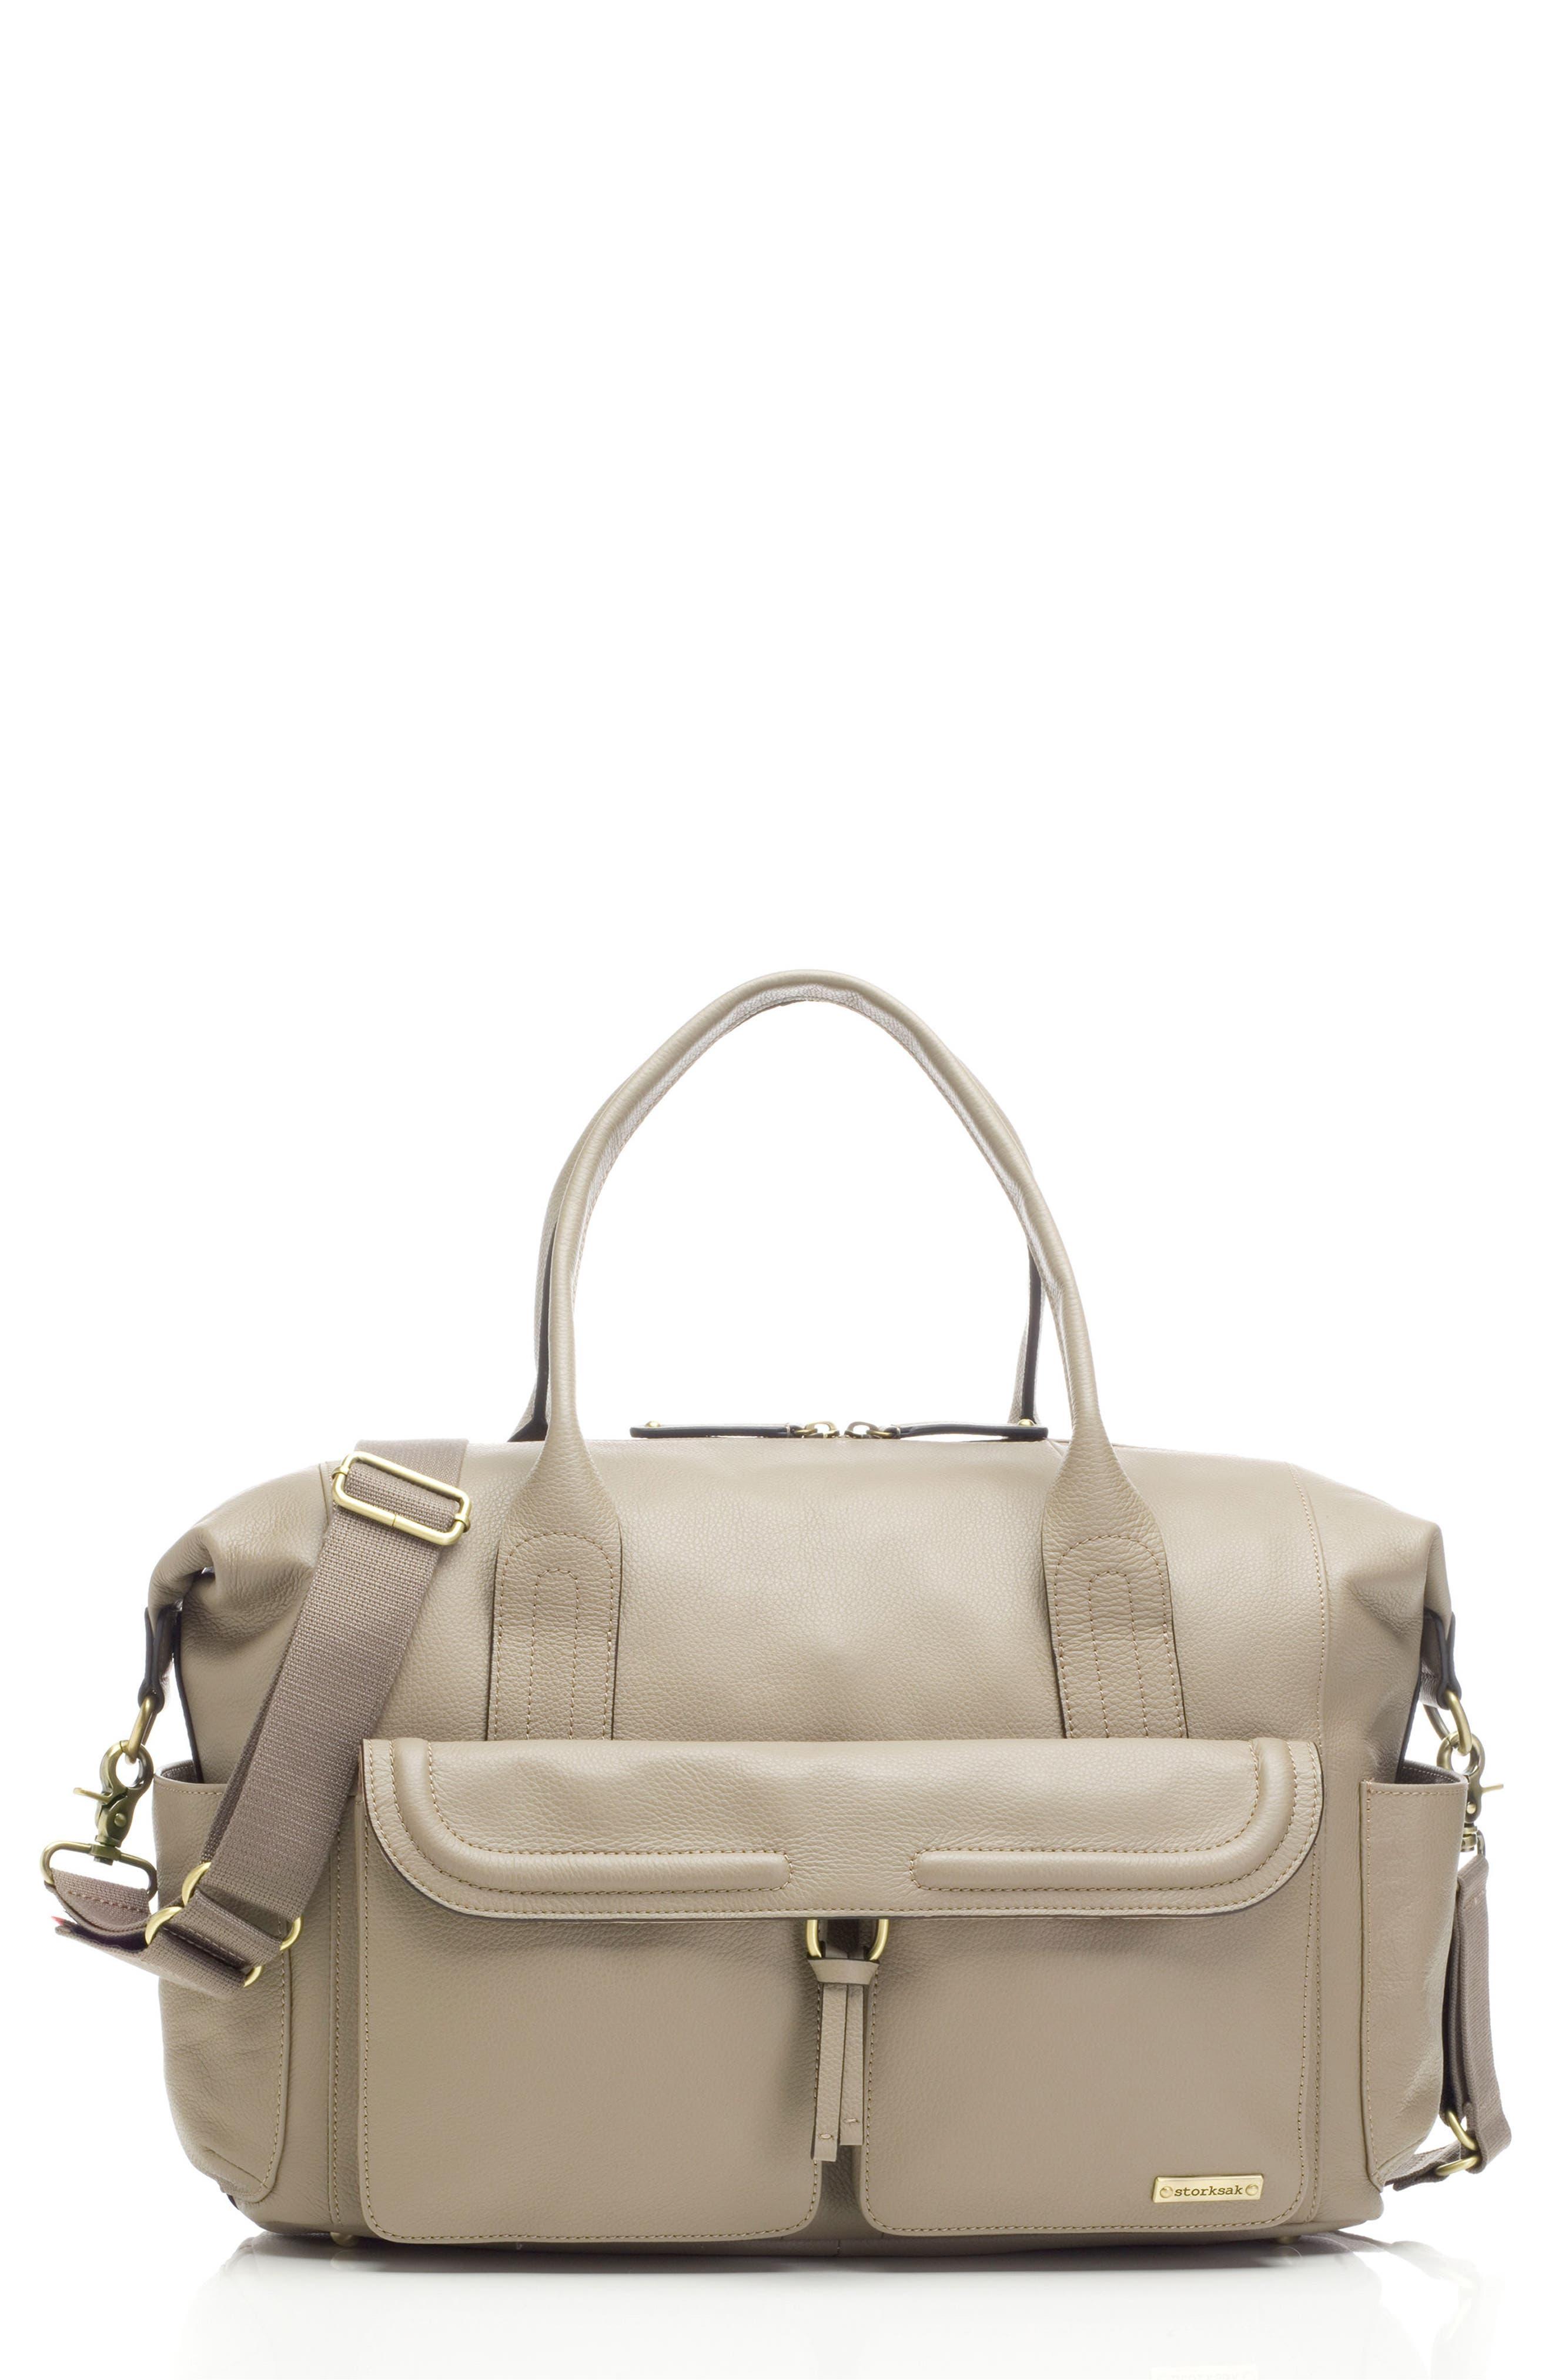 Storsak Leather Diaper Bag